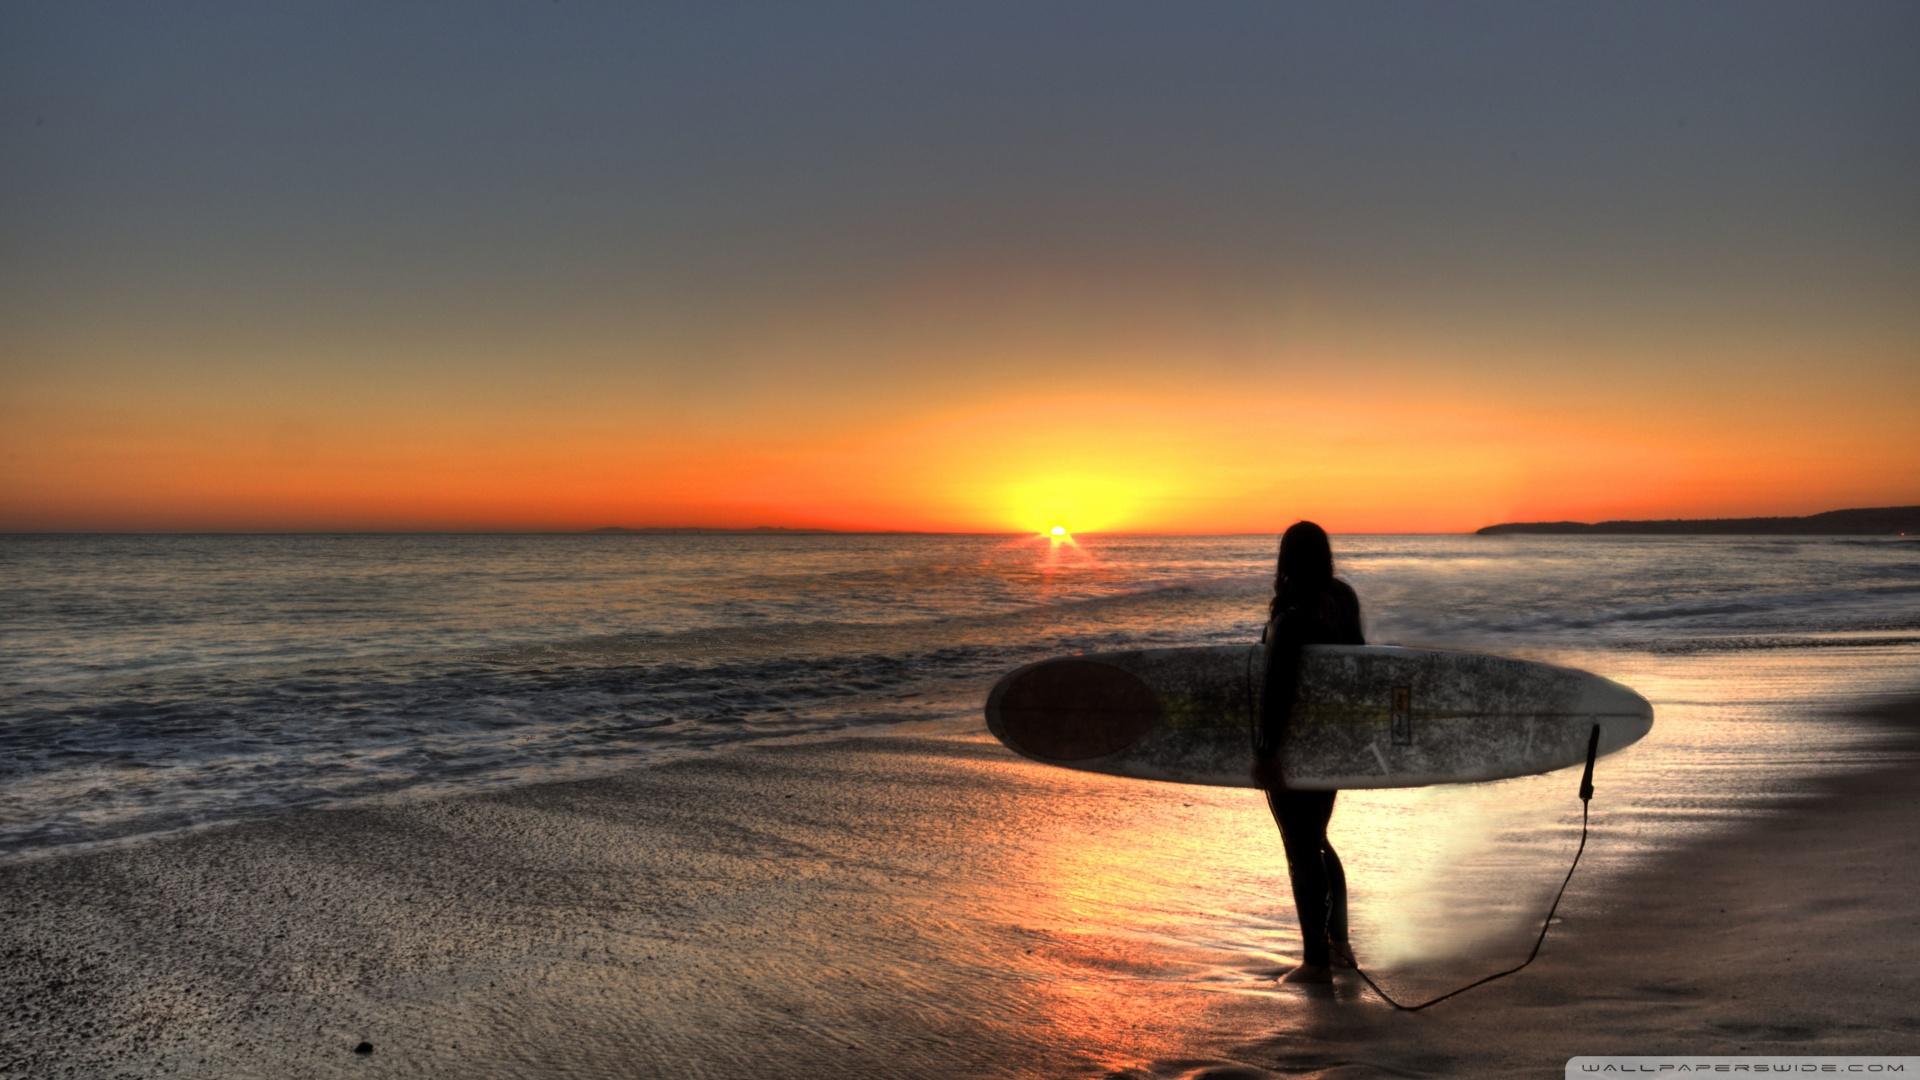 Image: Surf wallpaper HD 0010 - Album: Surf: Wallpaper, wallpapers ...